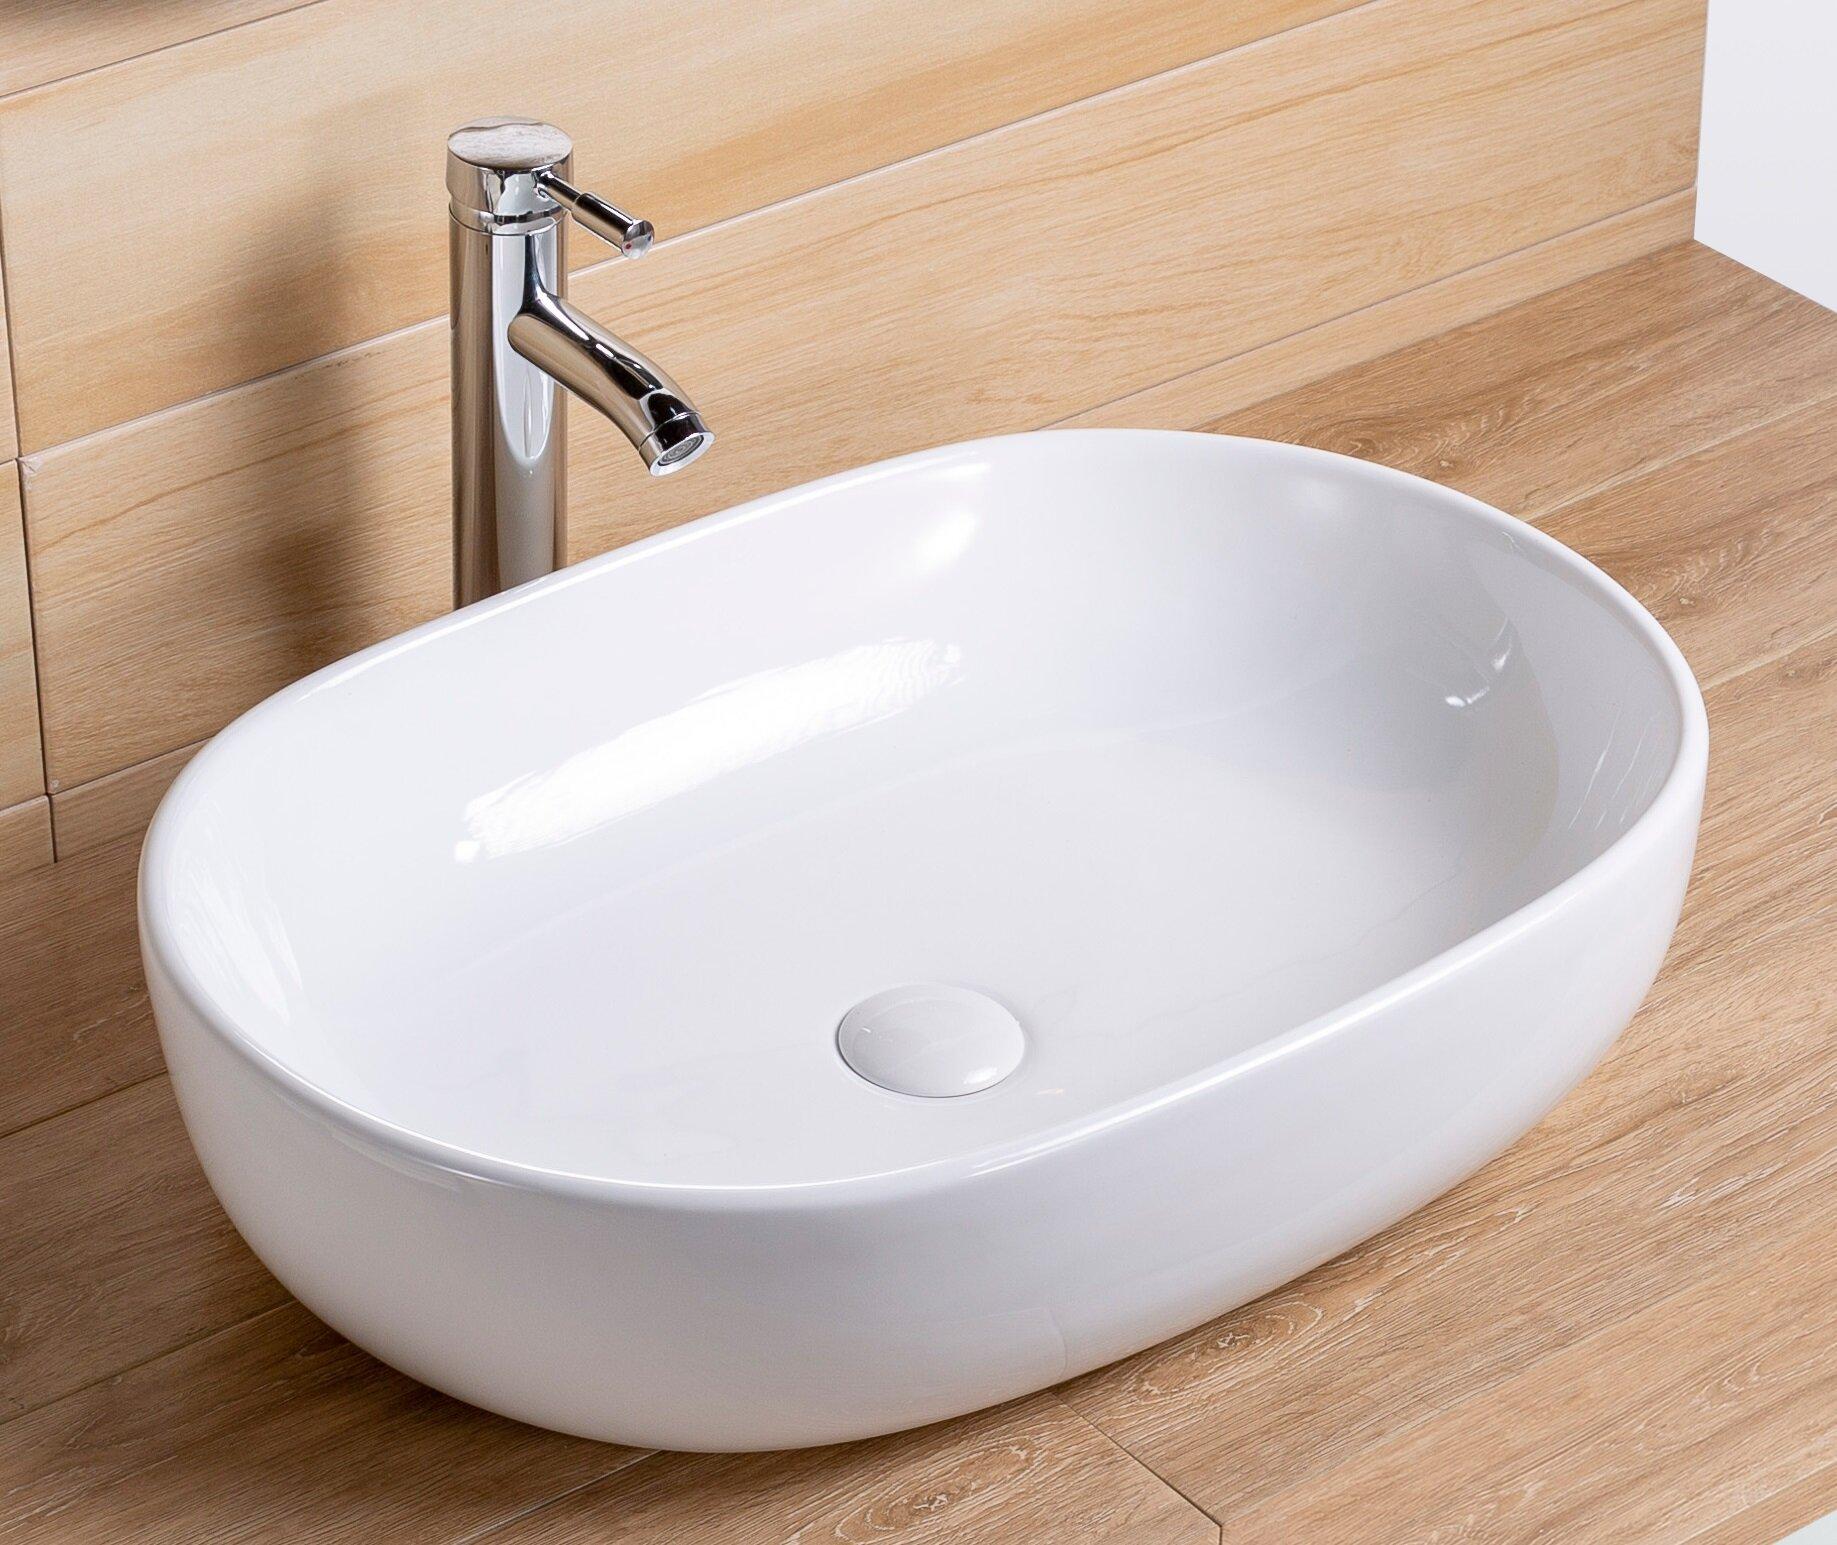 Topcraft White Ceramic Rectangular Topmount Bathroom Sink Wayfair